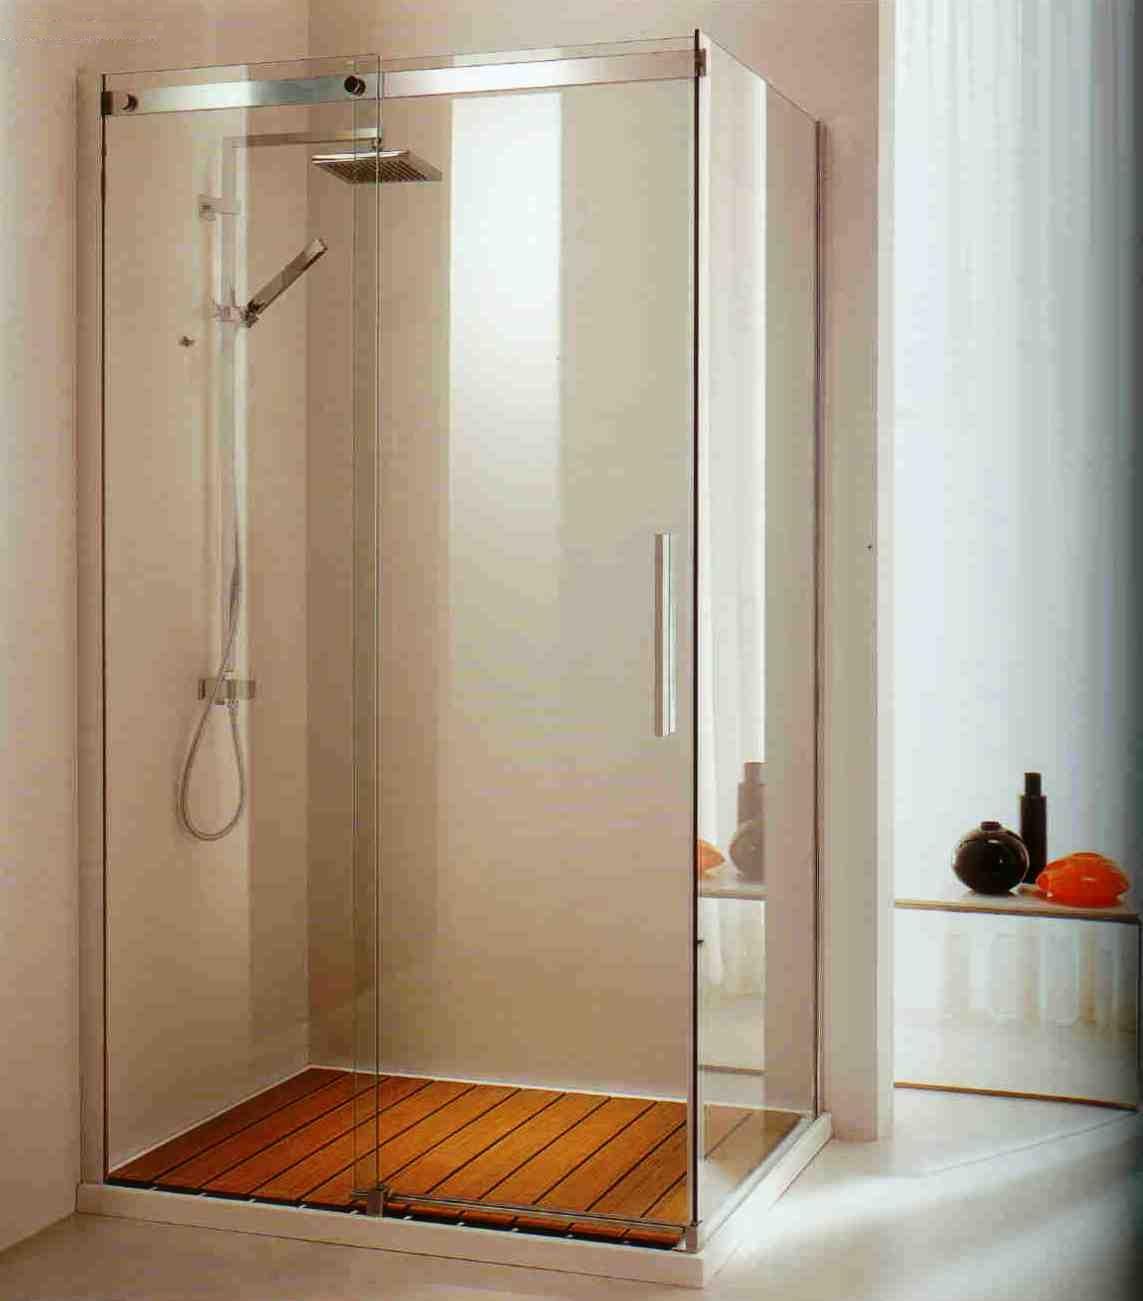 shower set hand shower set overhead shower